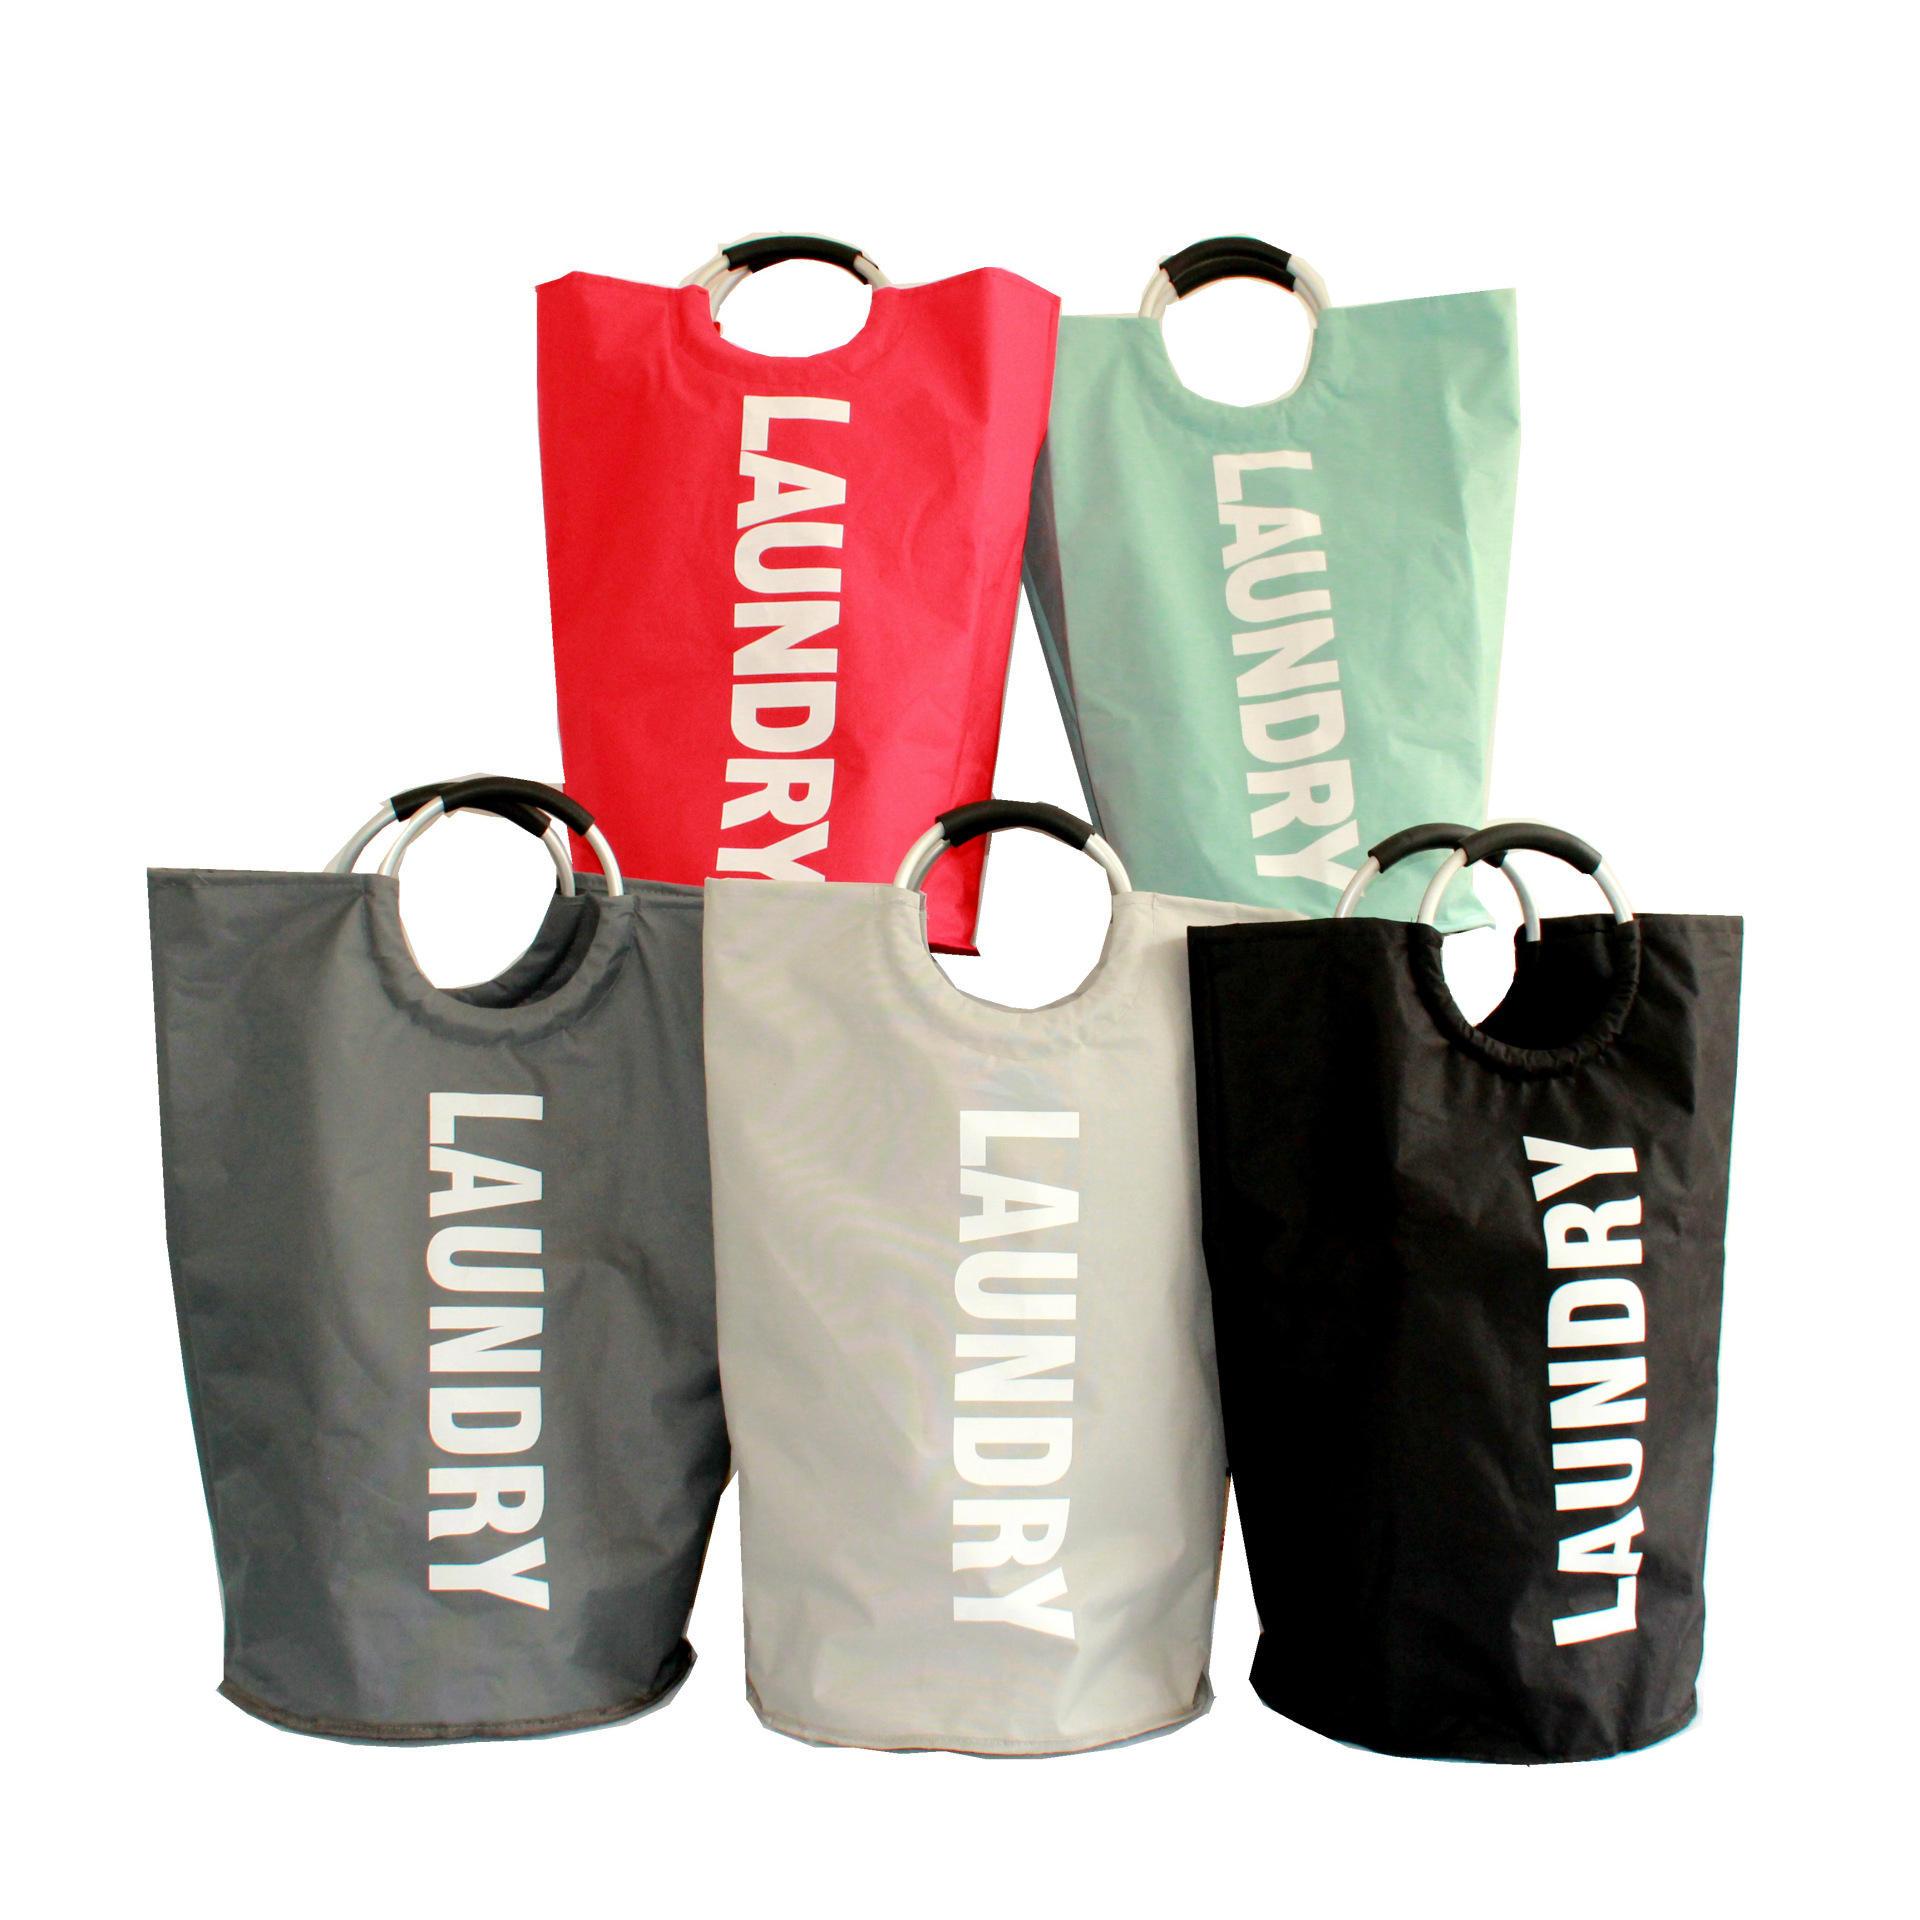 <span class=keywords><strong>Moda</strong></span> plegable bolsa de la ropa al por mayor de almacenamiento de uso en <span class=keywords><strong>casa</strong></span> bolsa de lavandería